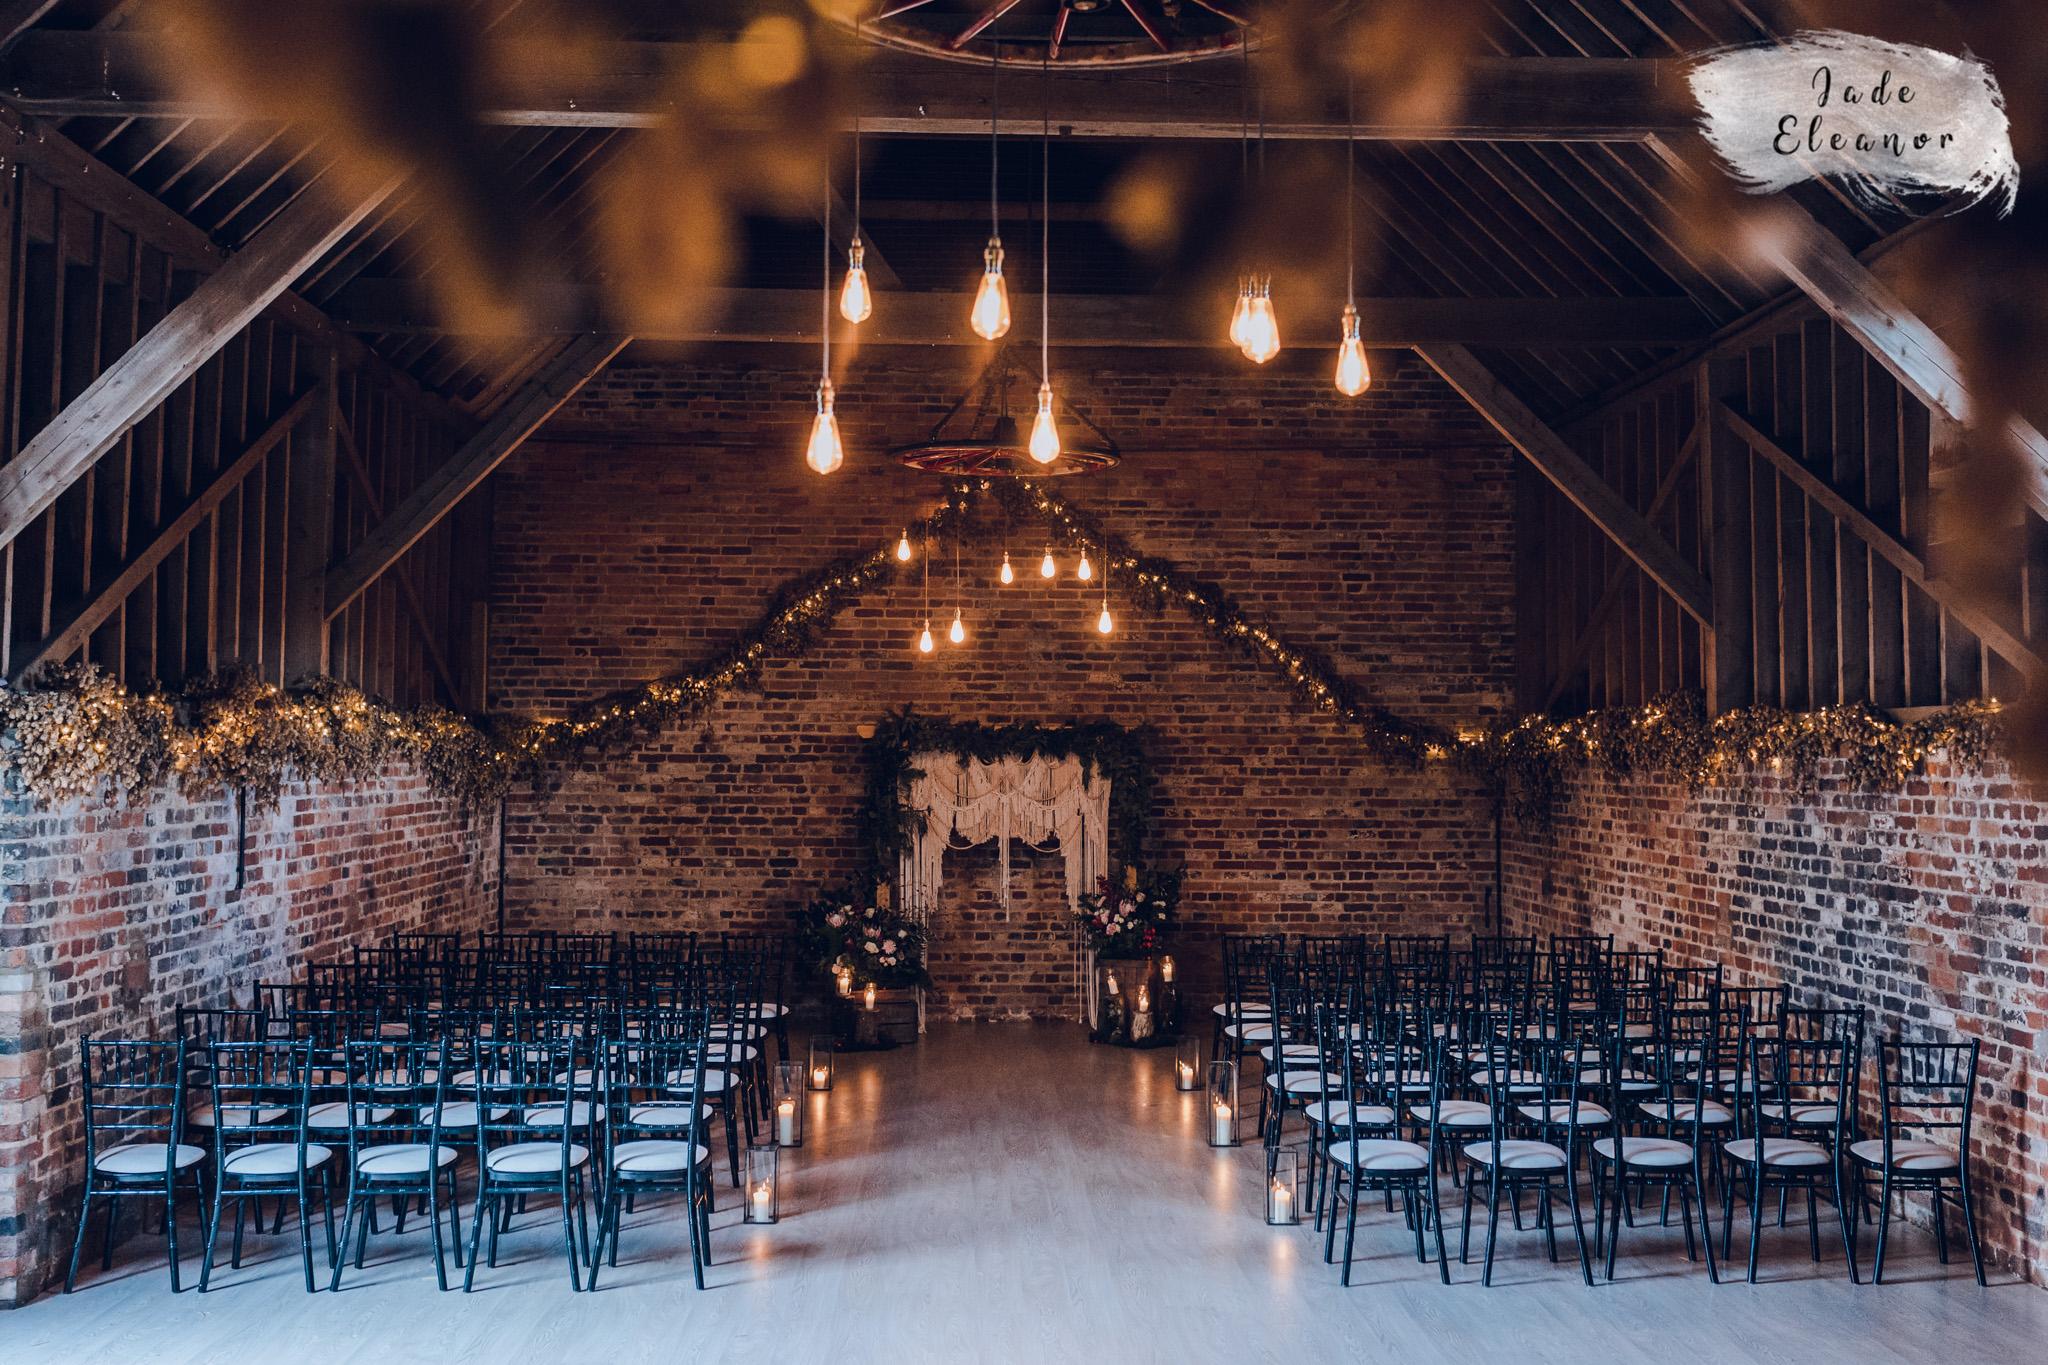 Bysshe Court Barn Wedding Jade Eleanor Photography-1.jpg